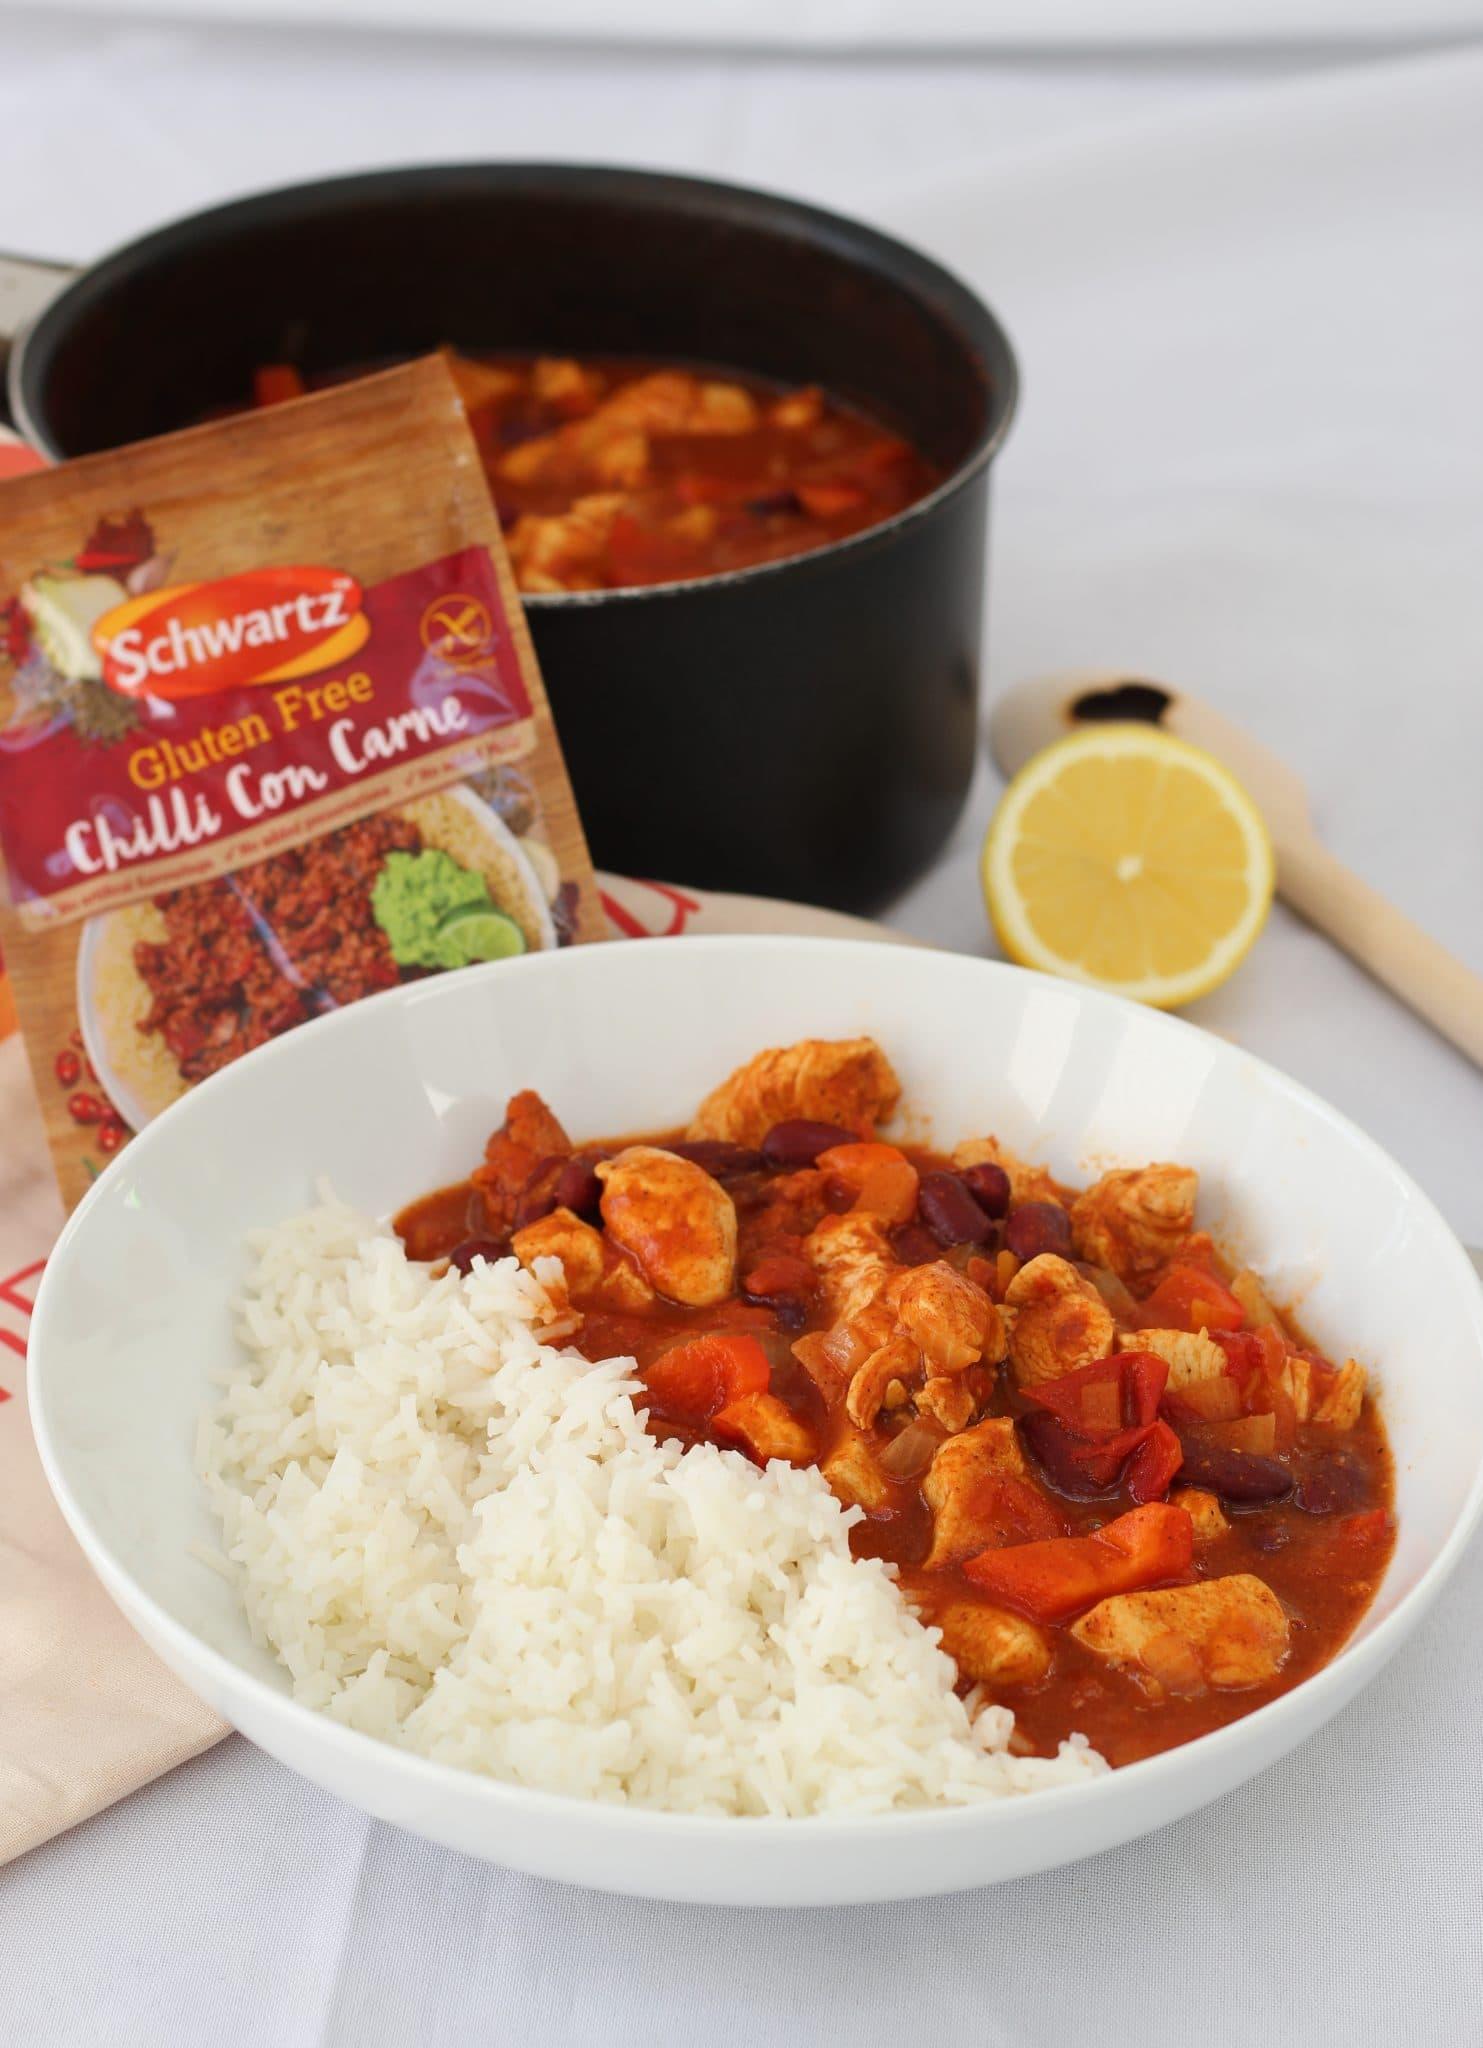 Schwartz chilli con carne mix and bowl of chicken chilli